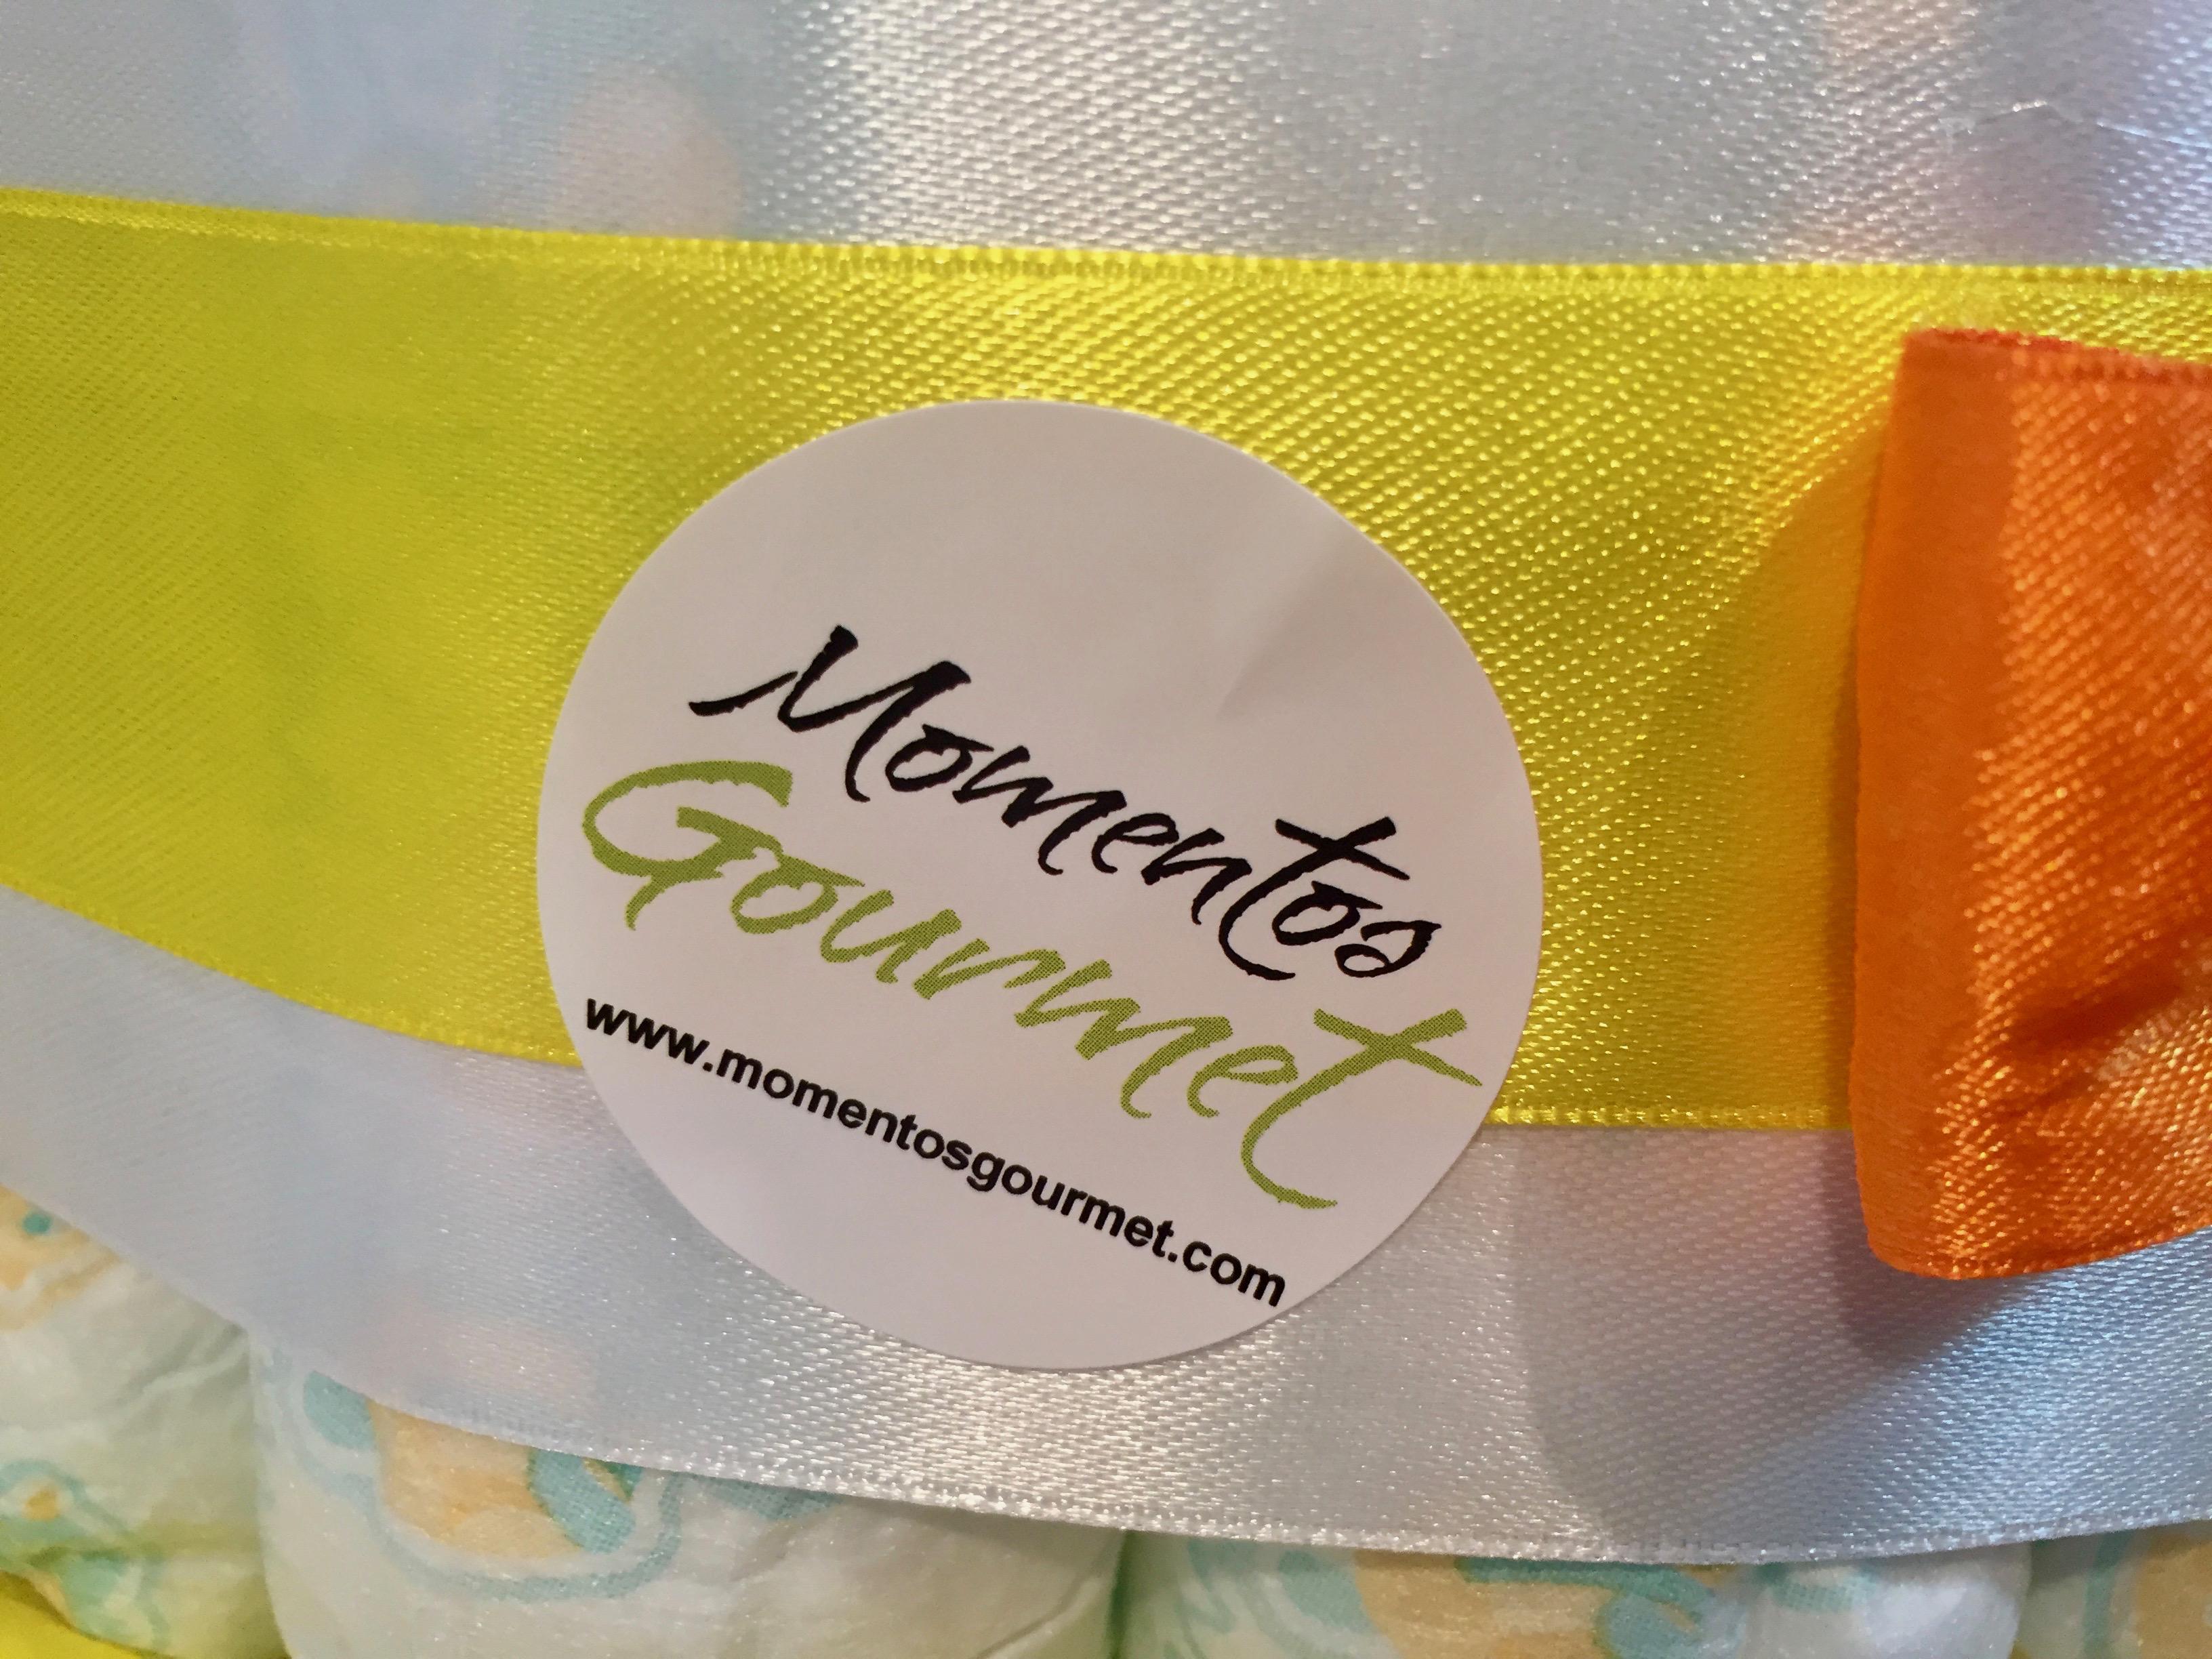 Tarta-de-pañales-Muñeca-amarilla-MomentosGourmet